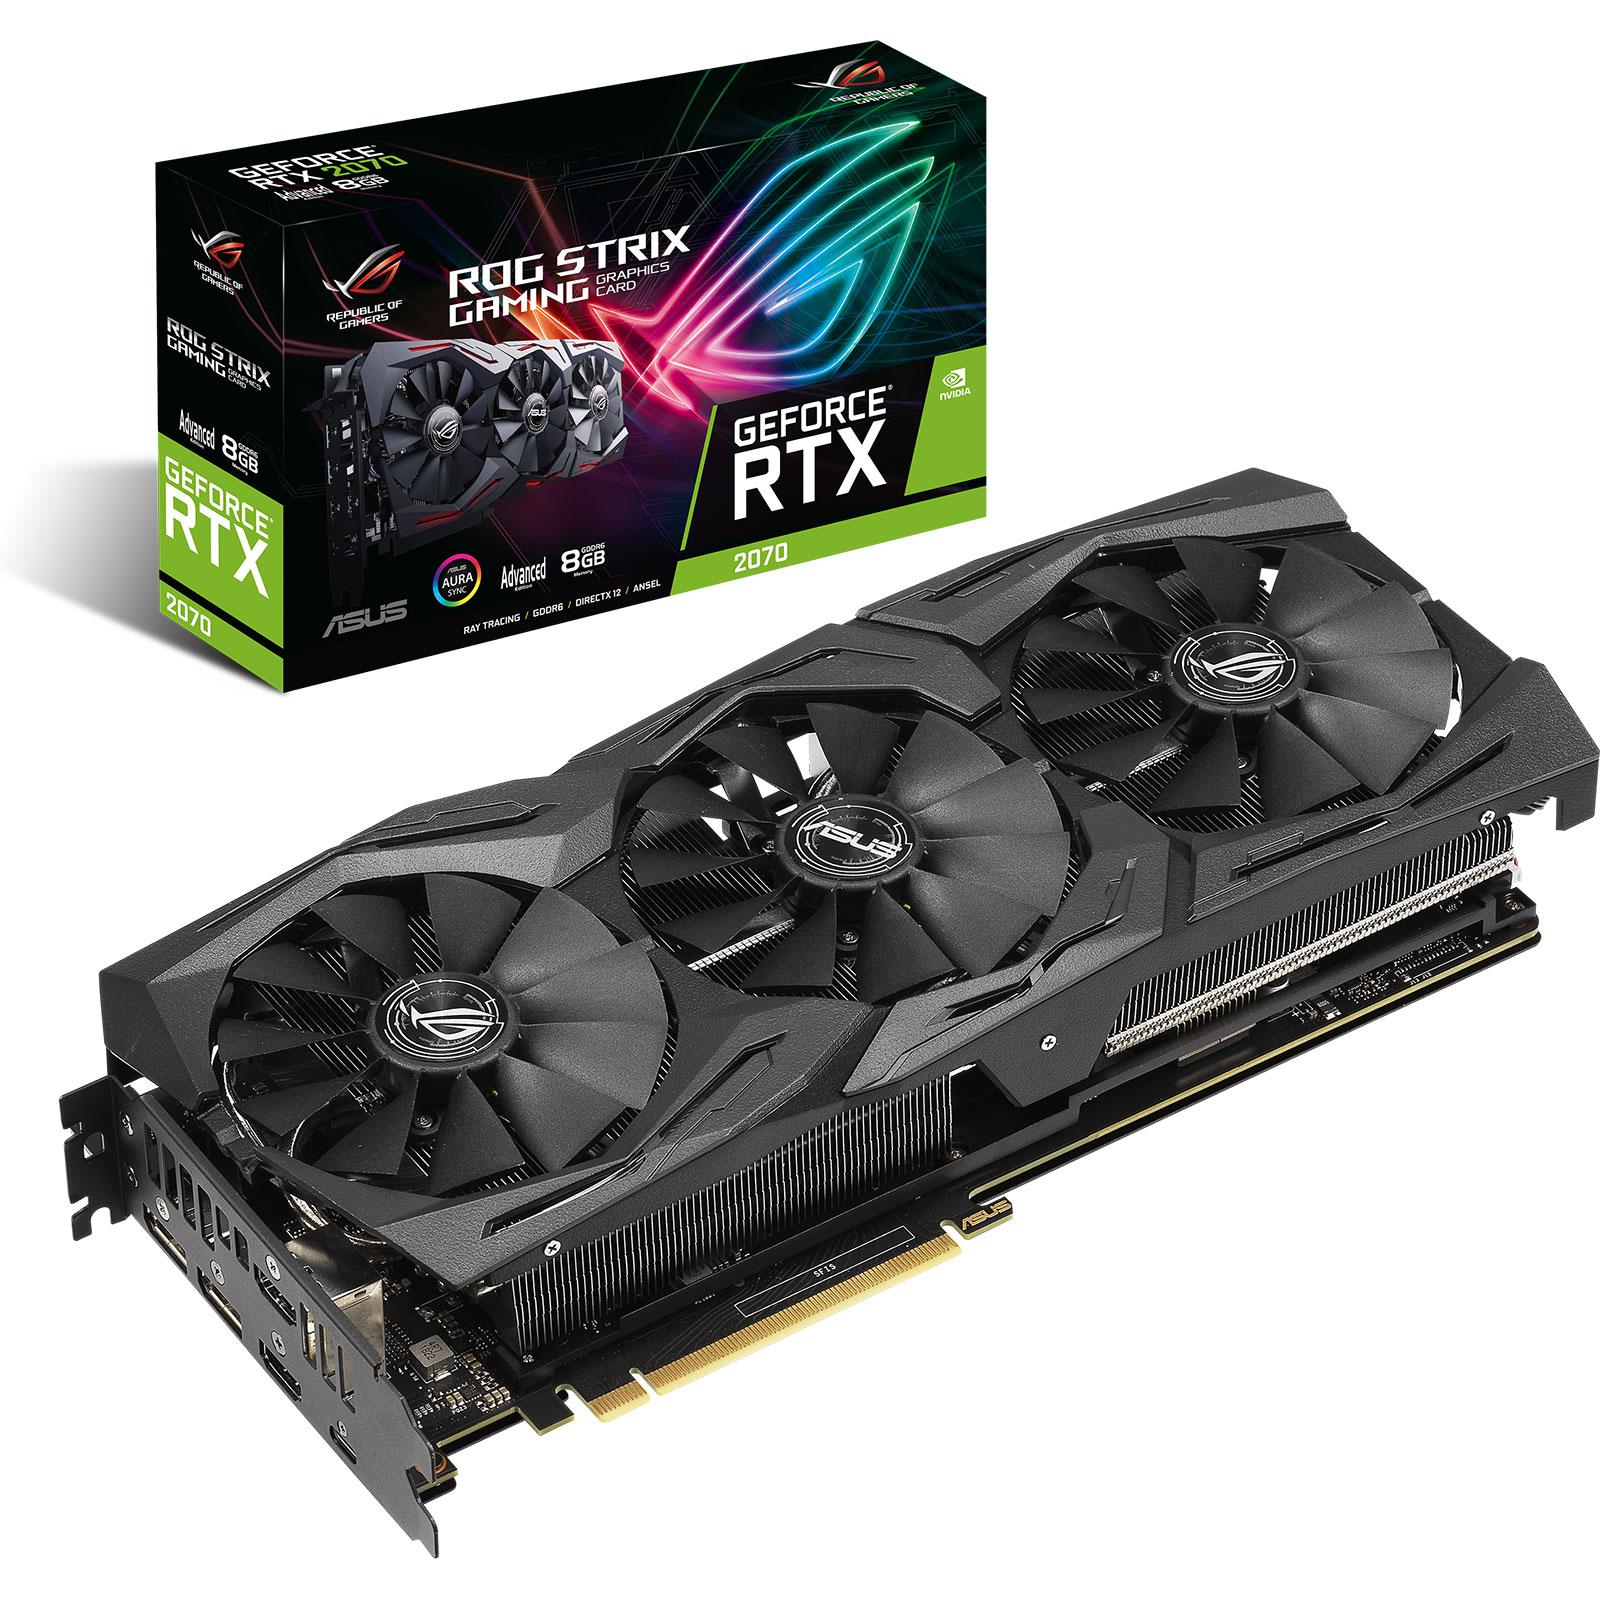 Carte graphique ASUS GeForce RTX 2070 ROG-STRIX-RTX2070-A8G-GAMING 8 Go GDDR6 - Dual HDMI/Dual DisplayPort/USB Type-C - PCI Express (NVIDIA GeForce RTX 2070)